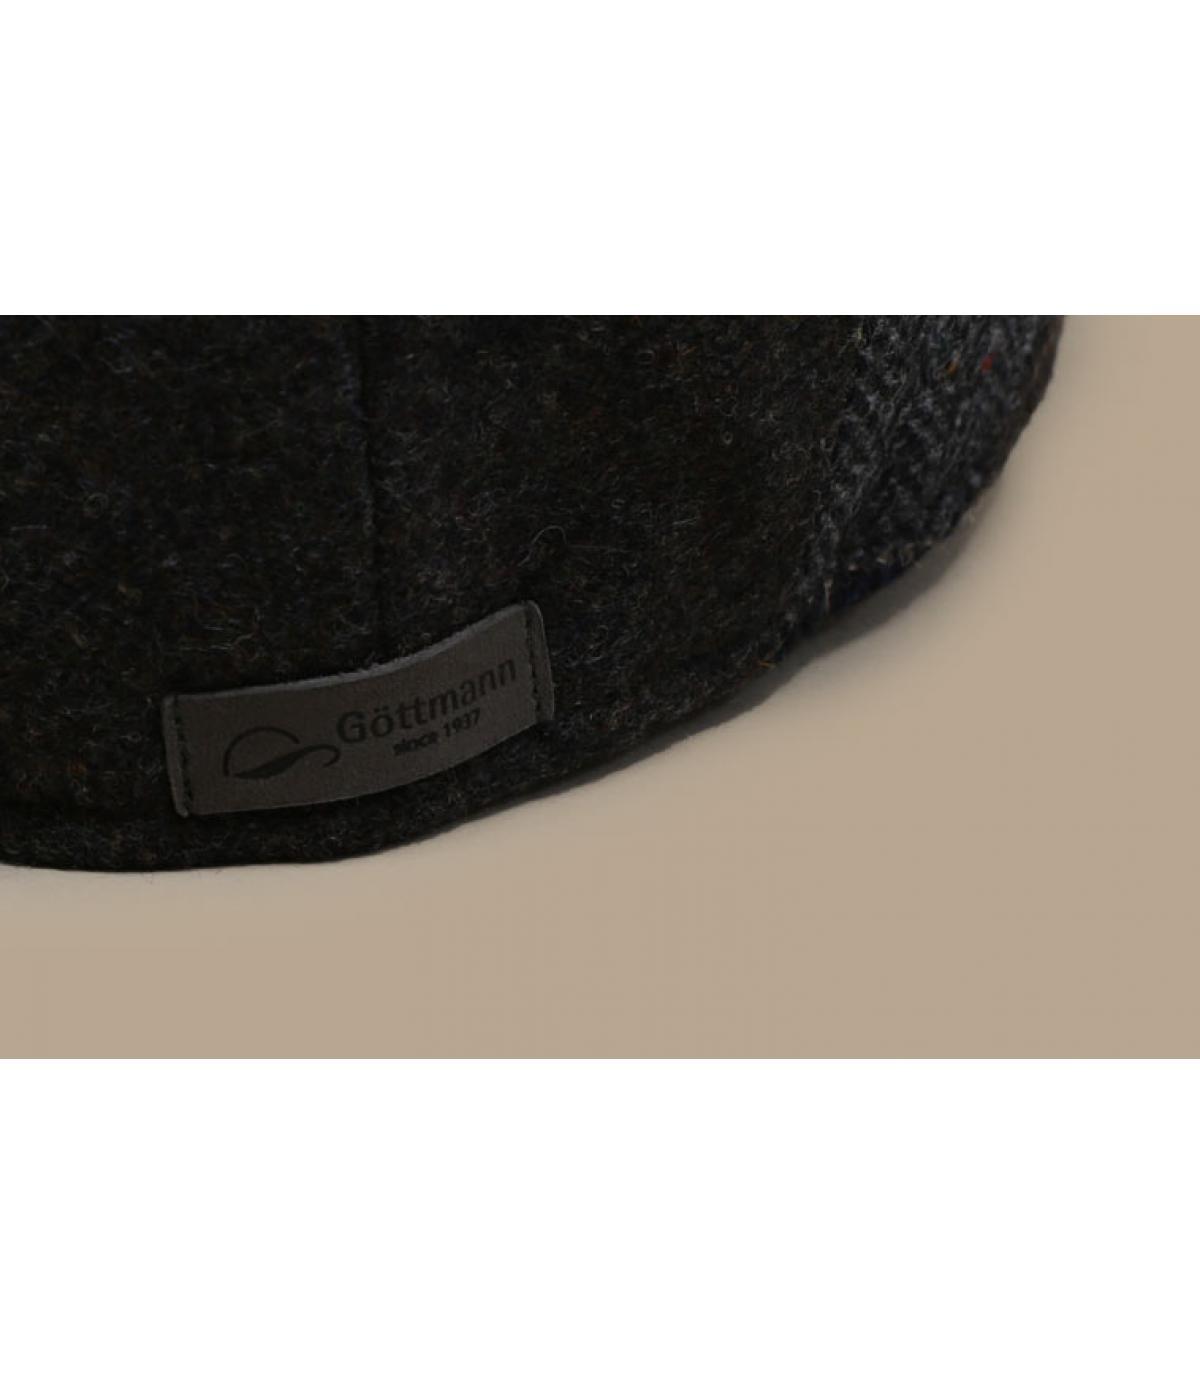 Details Daytona brown - Abbildung 3